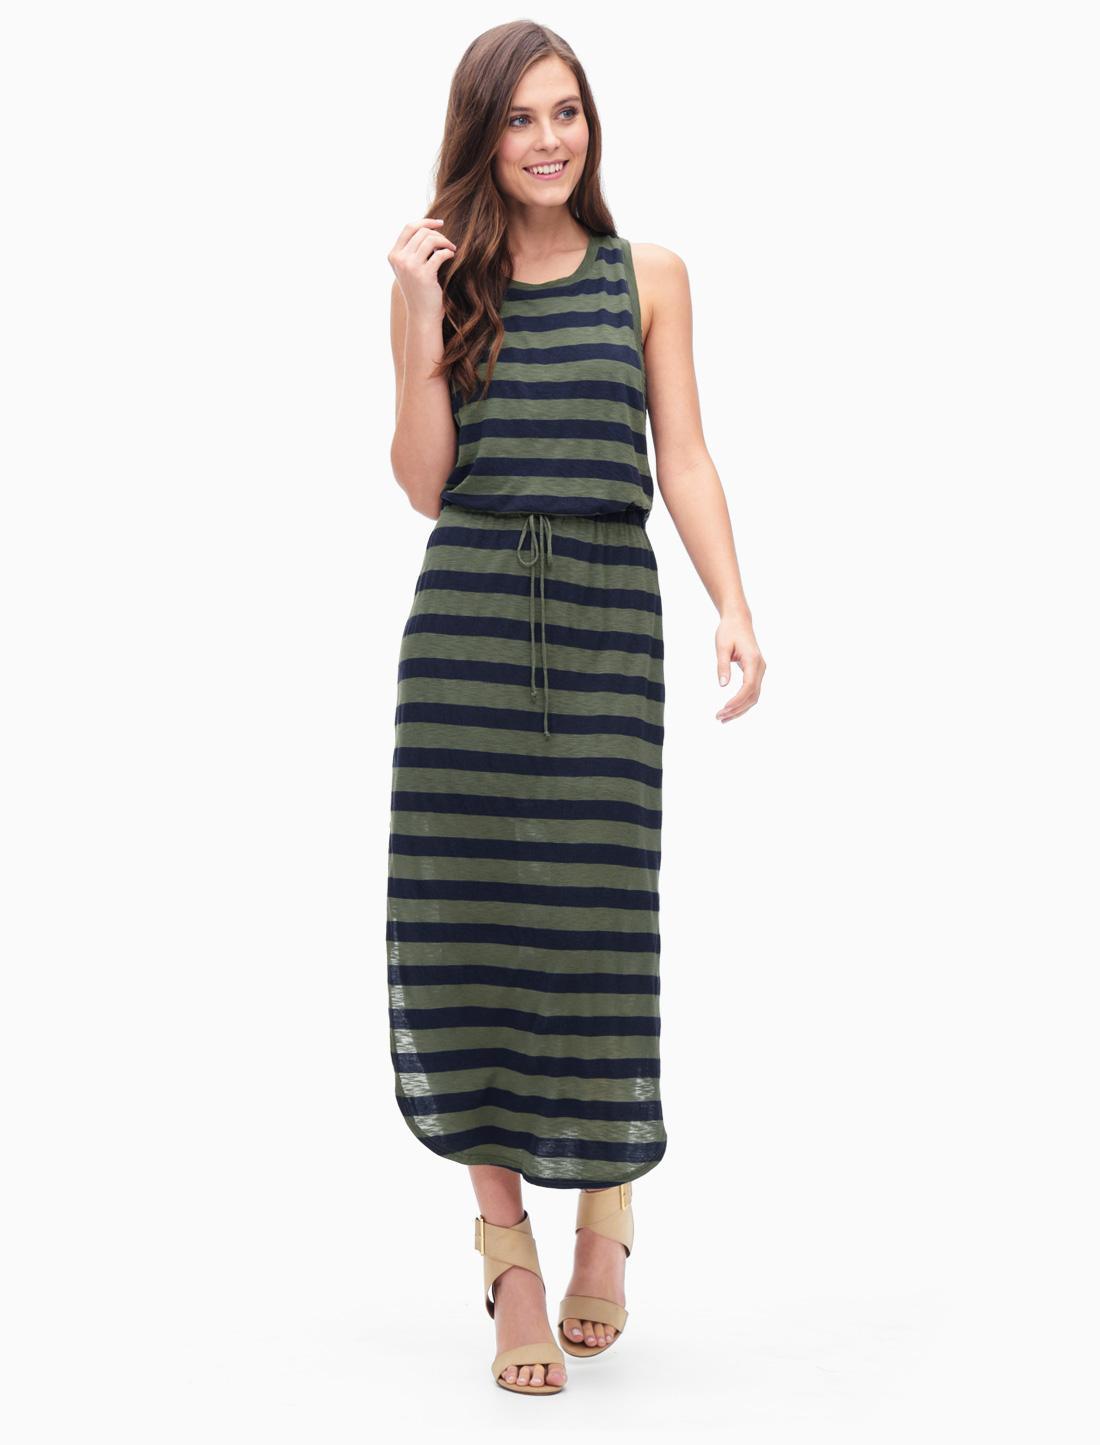 Elbow length sleeve splendid maxi dress